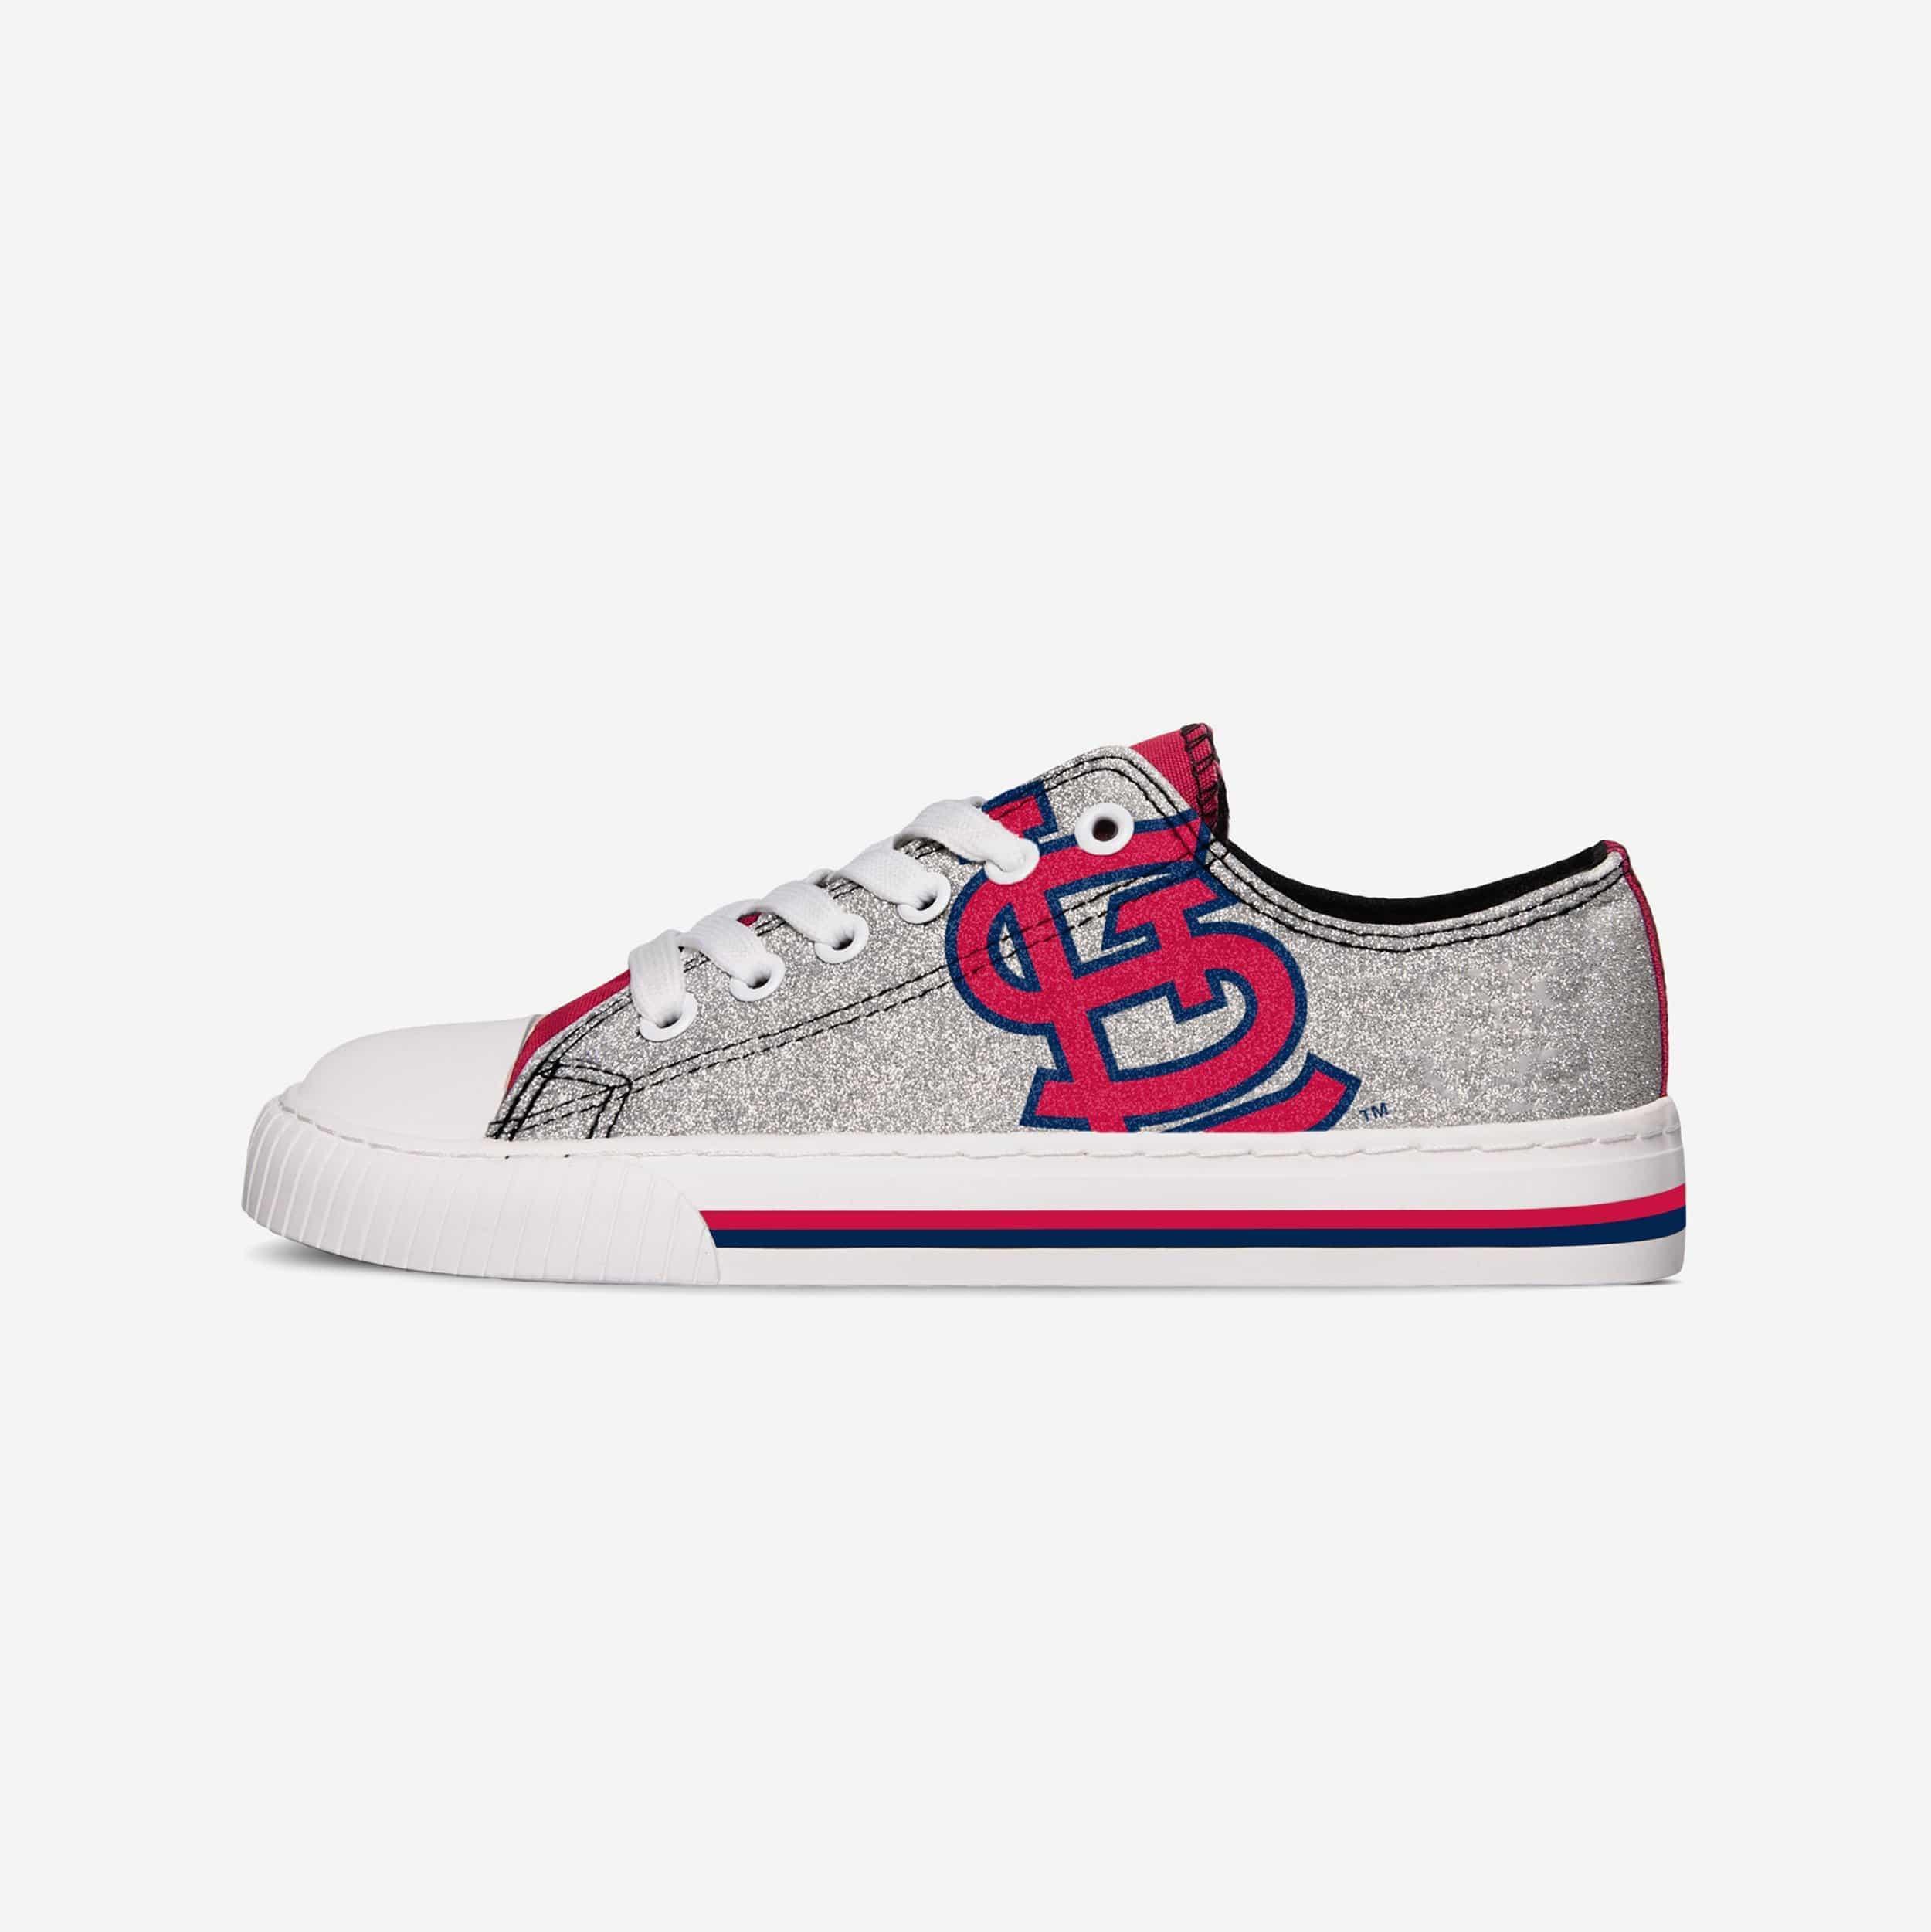 FOCO St Louis Cardinals Womens Glitter Low Top Canvas Shoes - 8